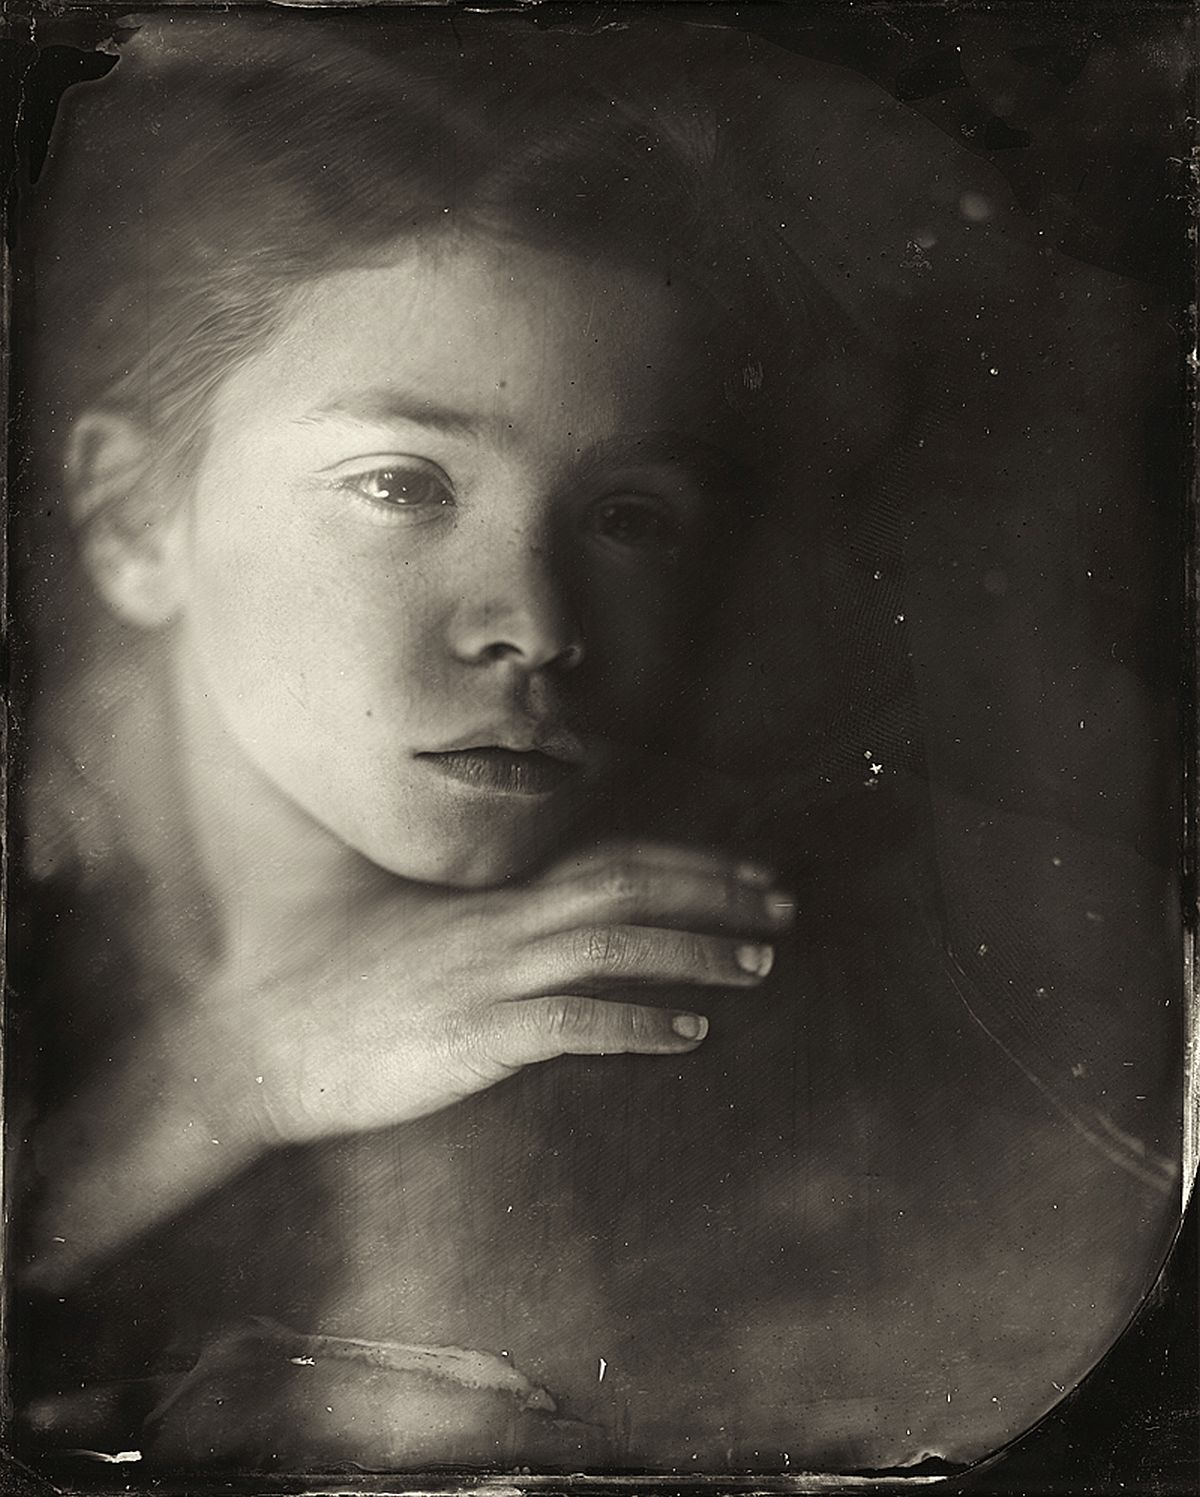 jacqueline-roberts-nebula-07